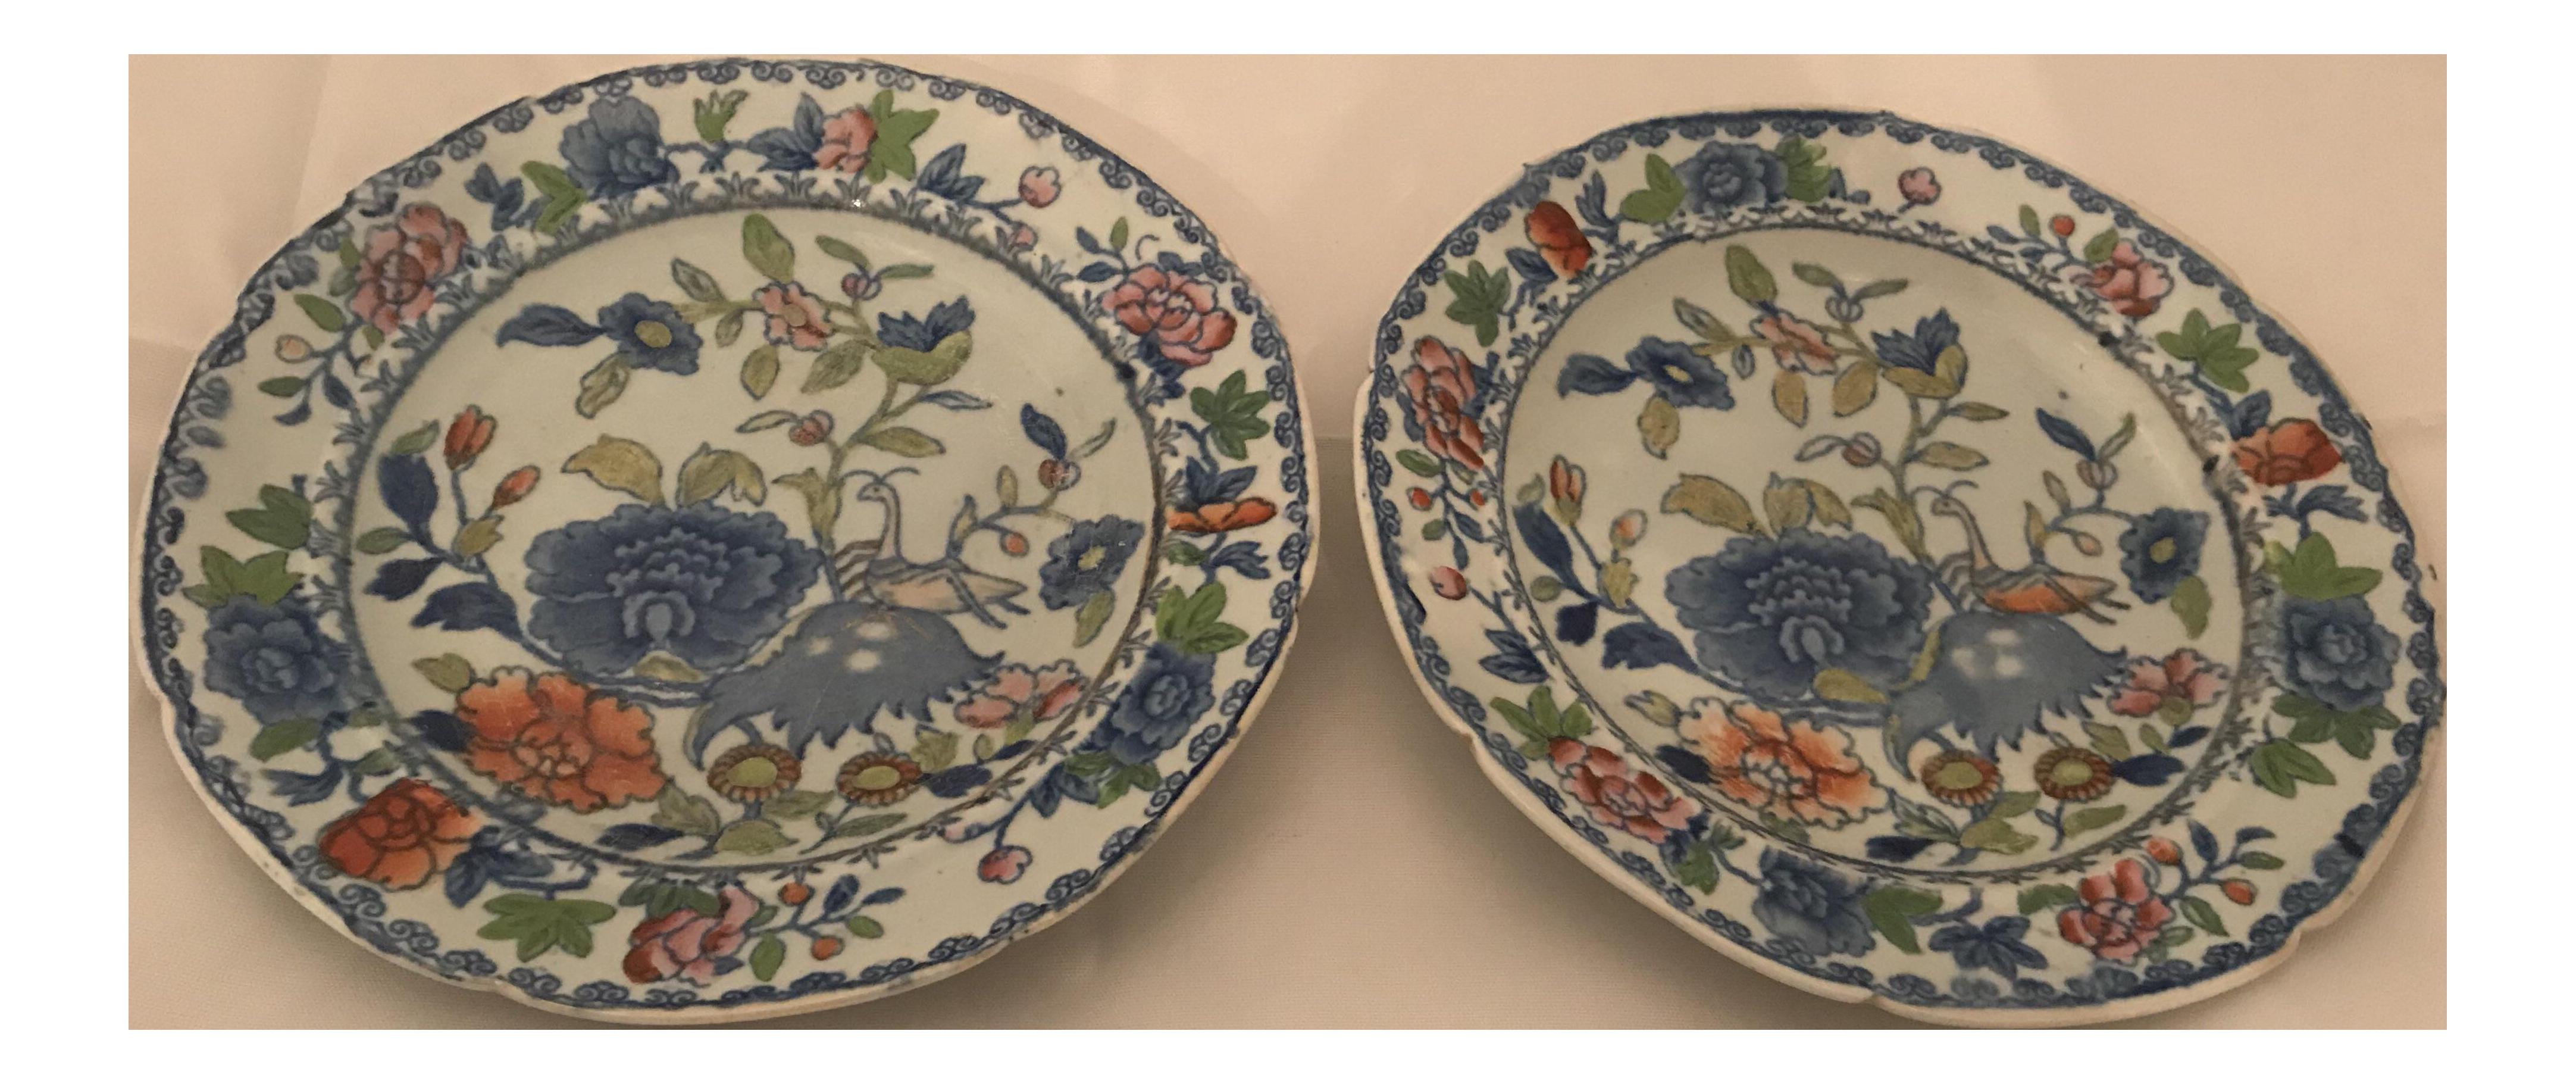 Masons Ironstone Plantation Colonial Salad Plates - a Pair  sc 1 st  Chairish & Masons Ironstone Plantation Colonial Salad Plates - a Pair   Chairish